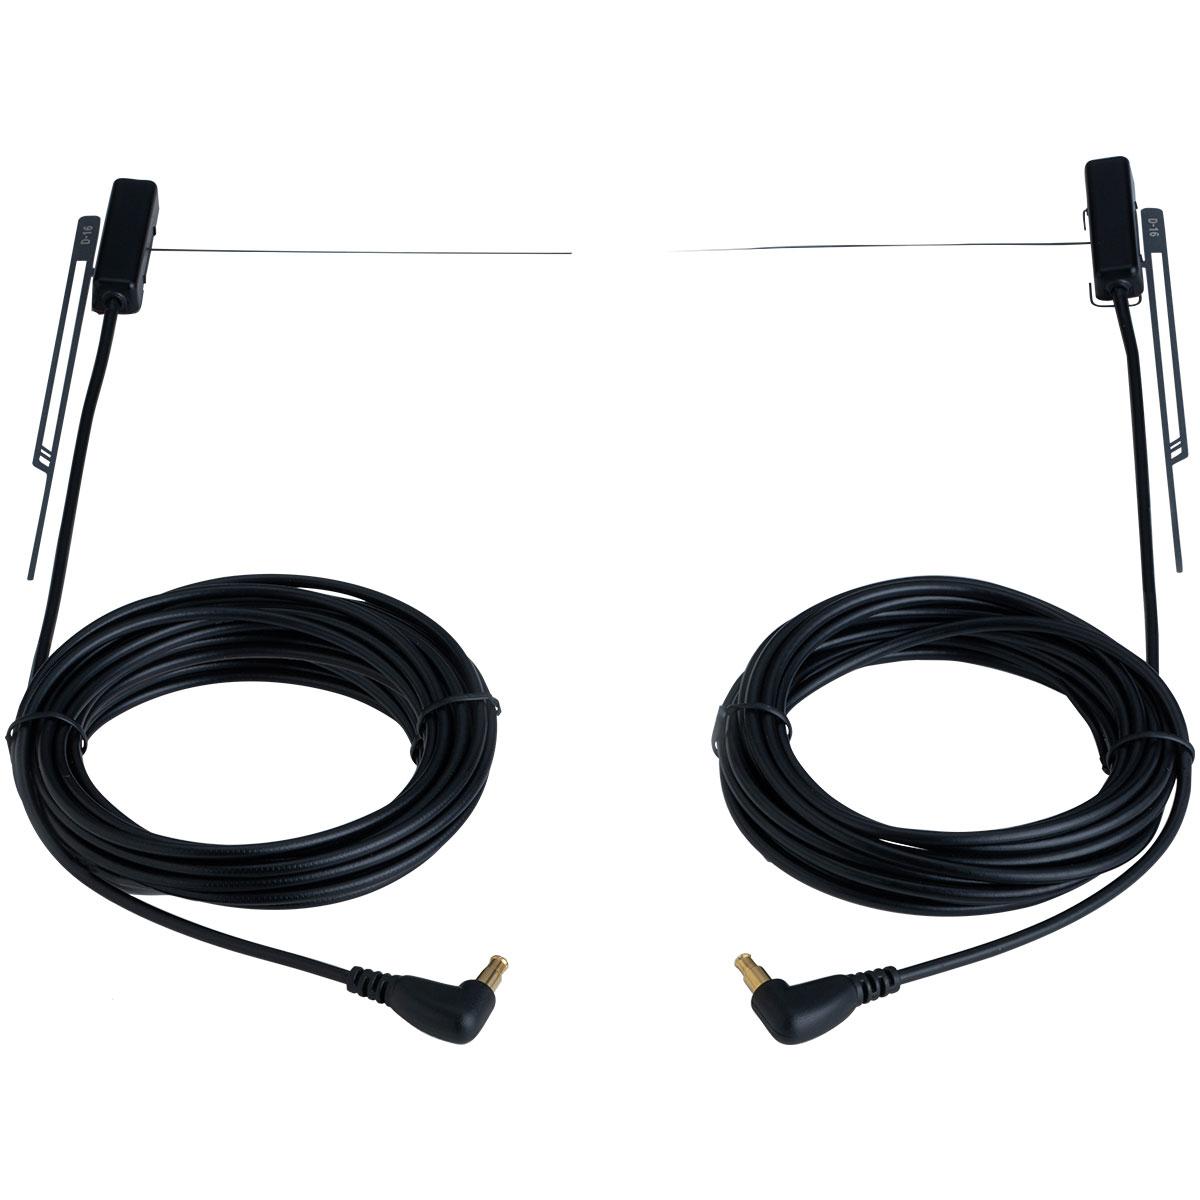 「RQ-E817PVF/RQ-E818PVF」専用地デジ用ブースター付きプリントアンテナ